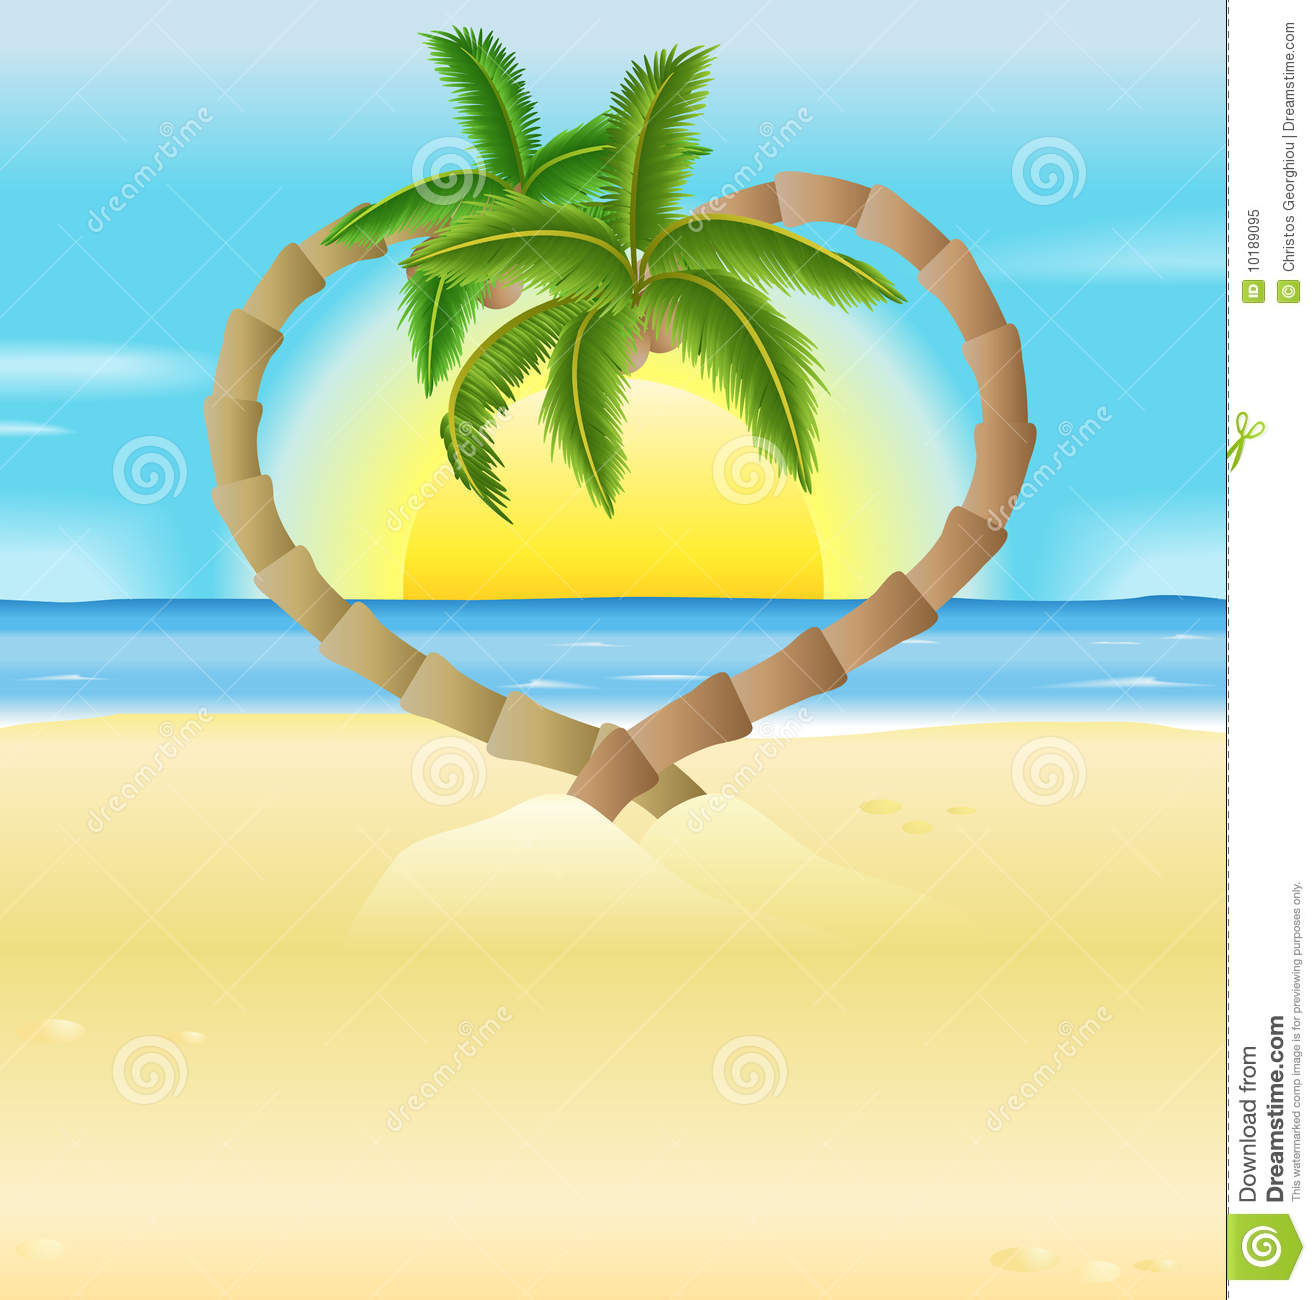 Beach wedding clipart - Clipground